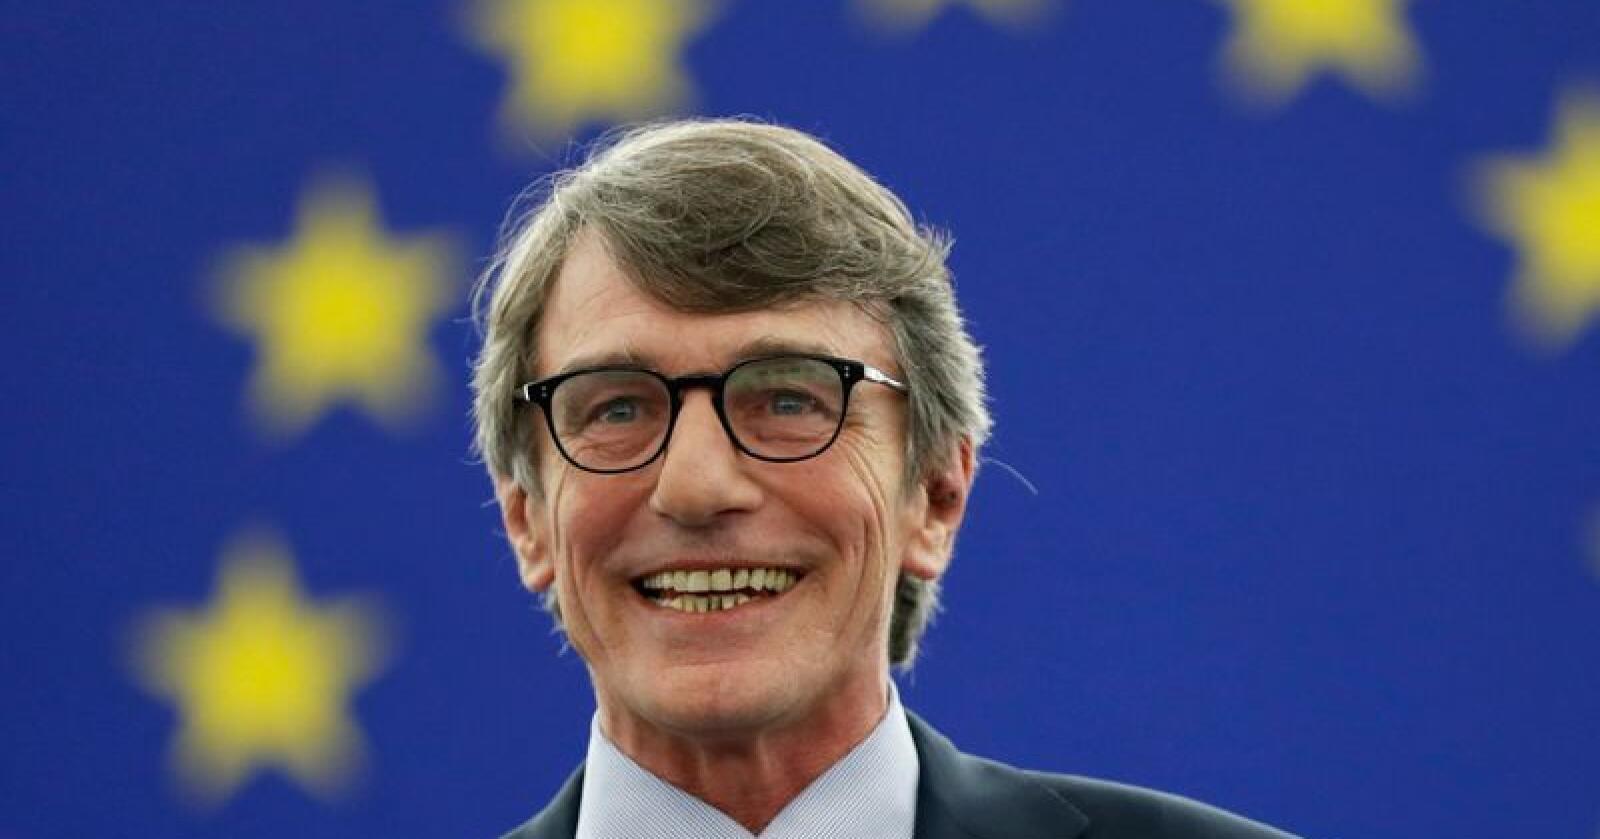 Italienske David-Maria Sassoli er valgt til ny president i EU-parlamentet. Foto: Jean-François Badias / AP / NTB scanpix